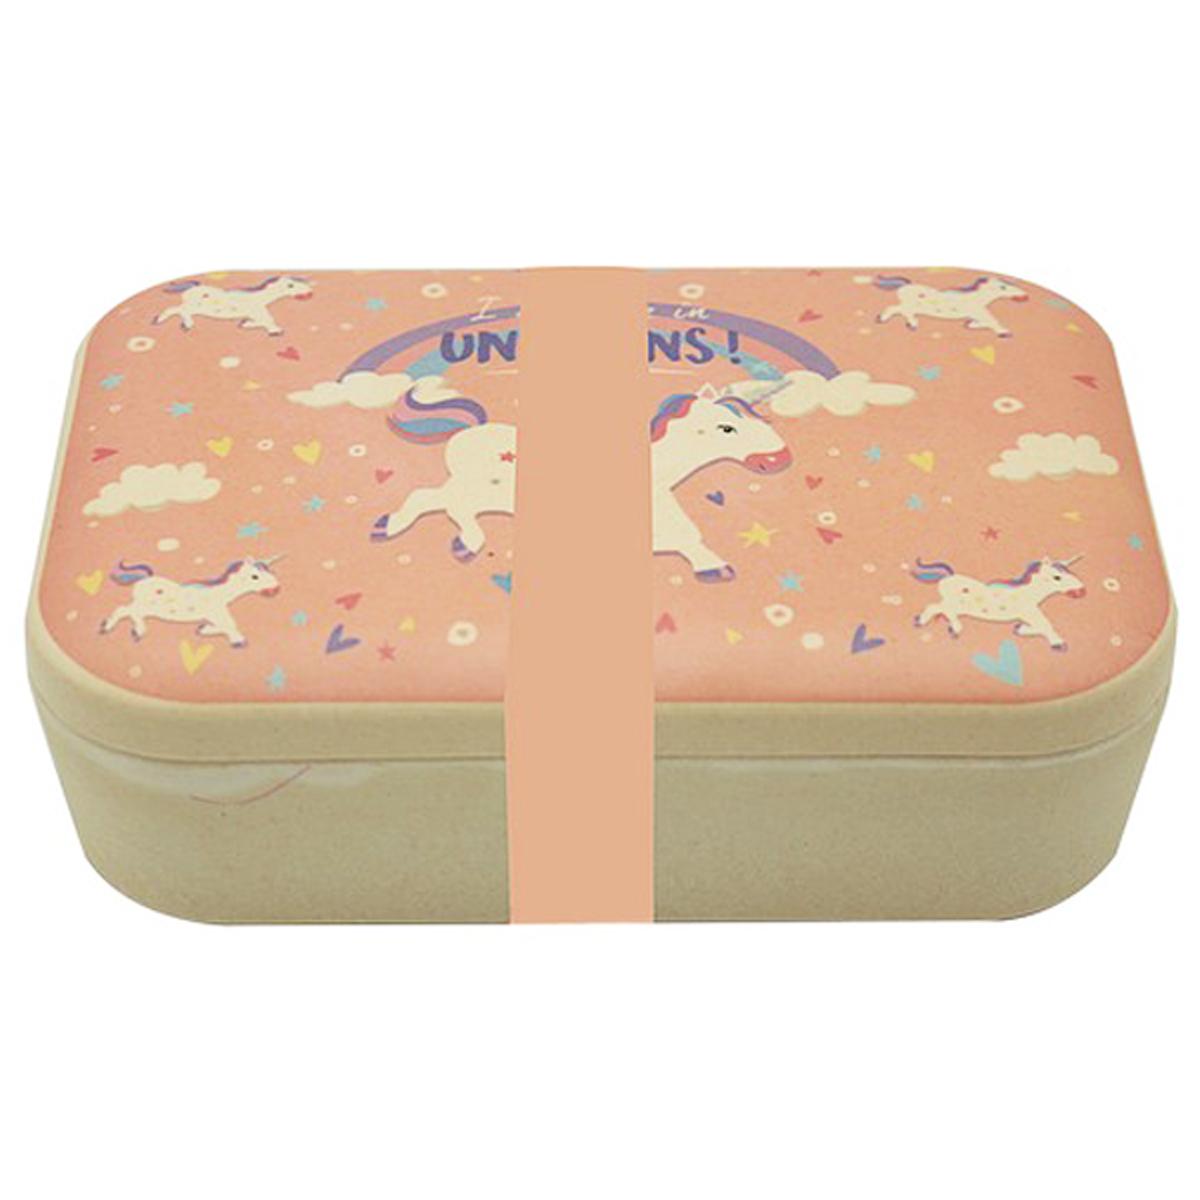 Lunch box bambou \'Licorne My Unicorn\' rose beige - 19x13x6 cm - [R0617]